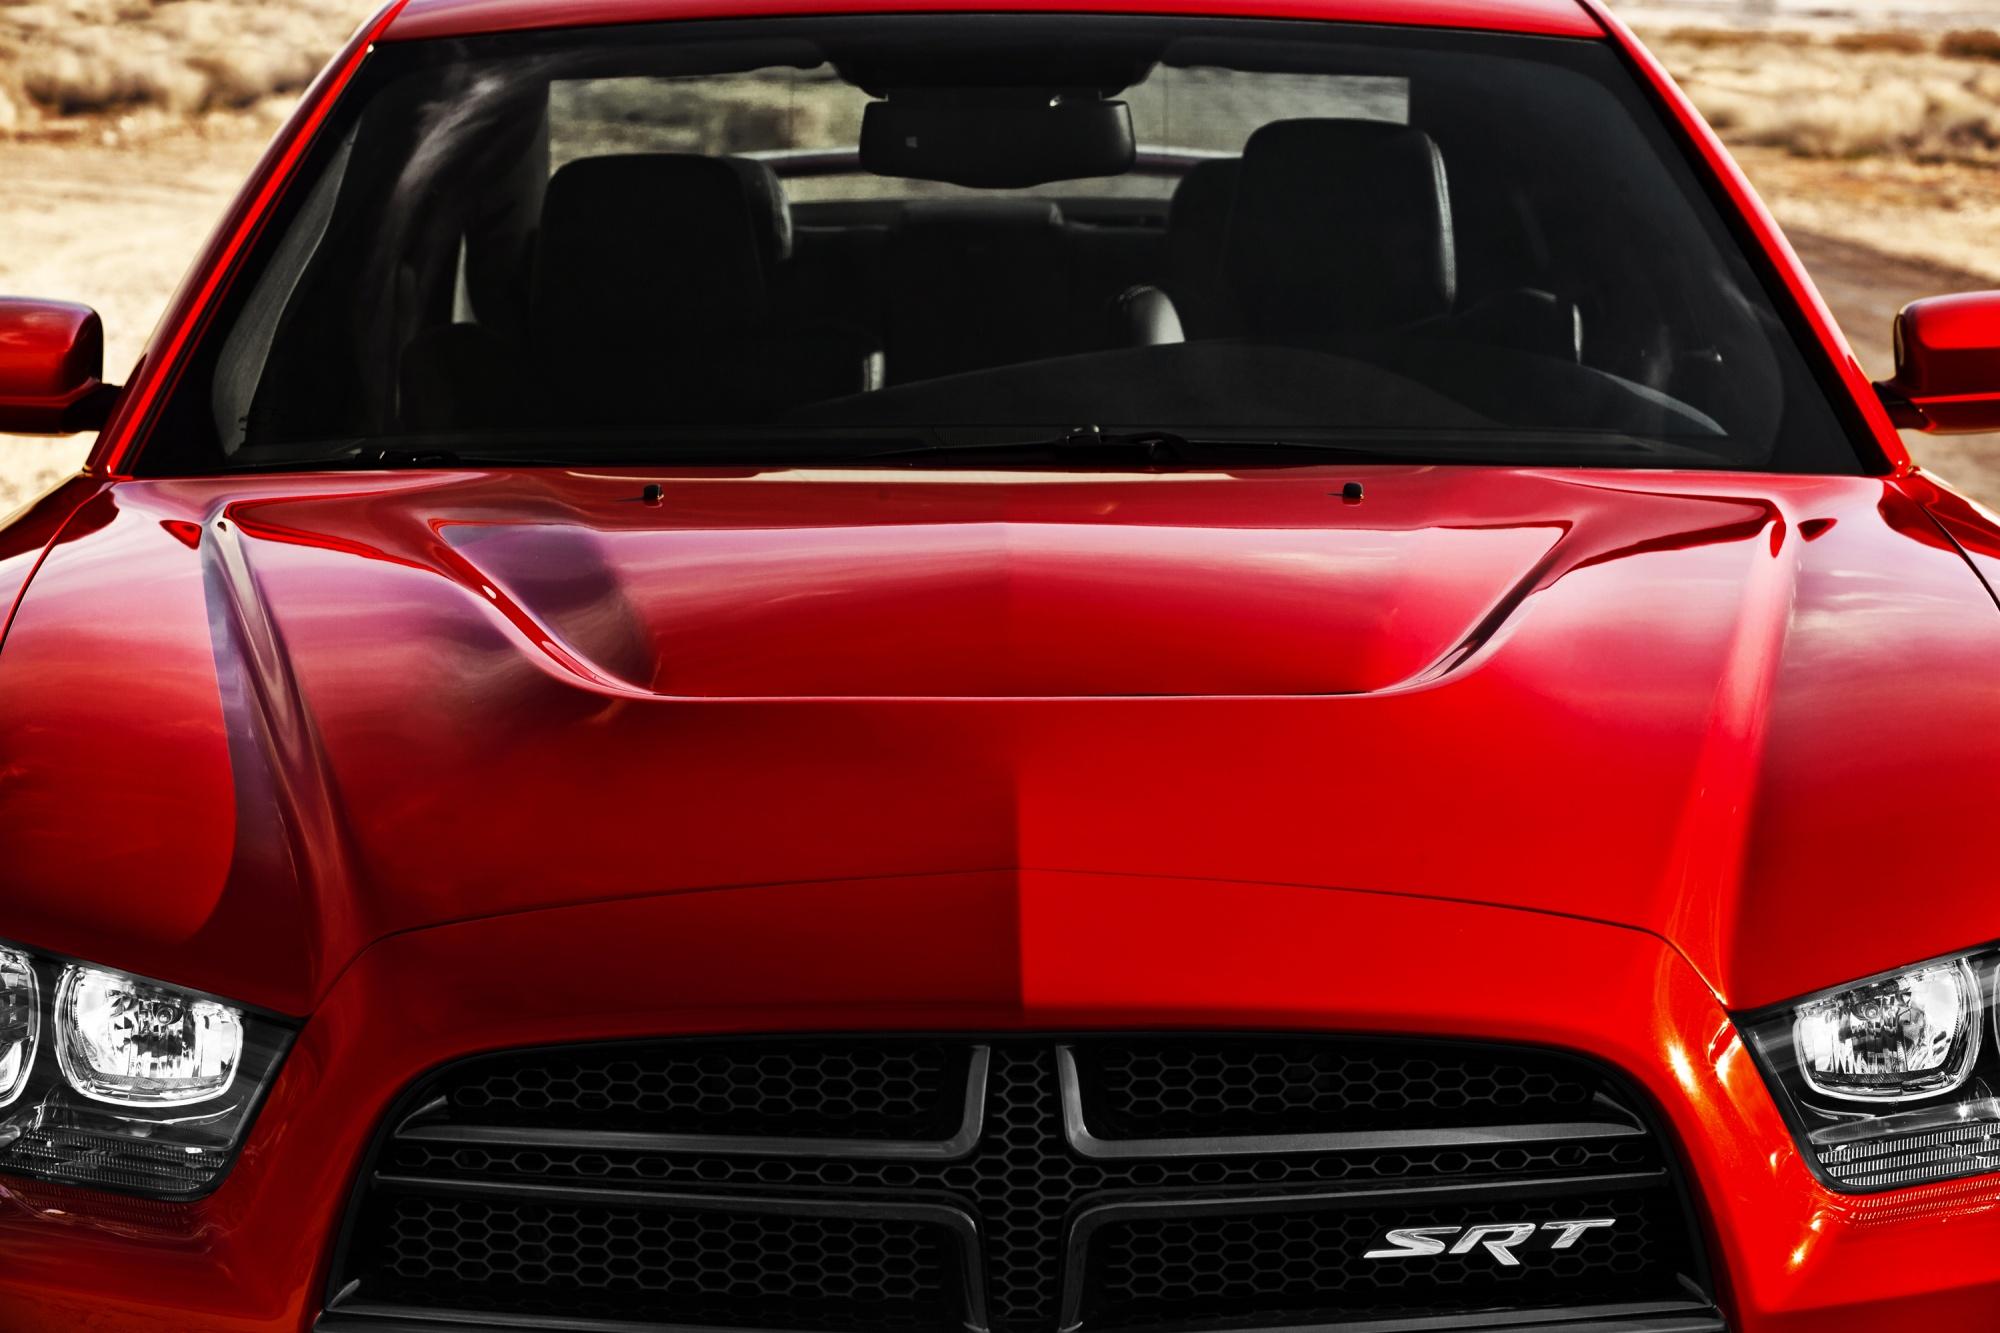 Dodge Charger Challenger Srt8 To Get 570 Hp Supercharger